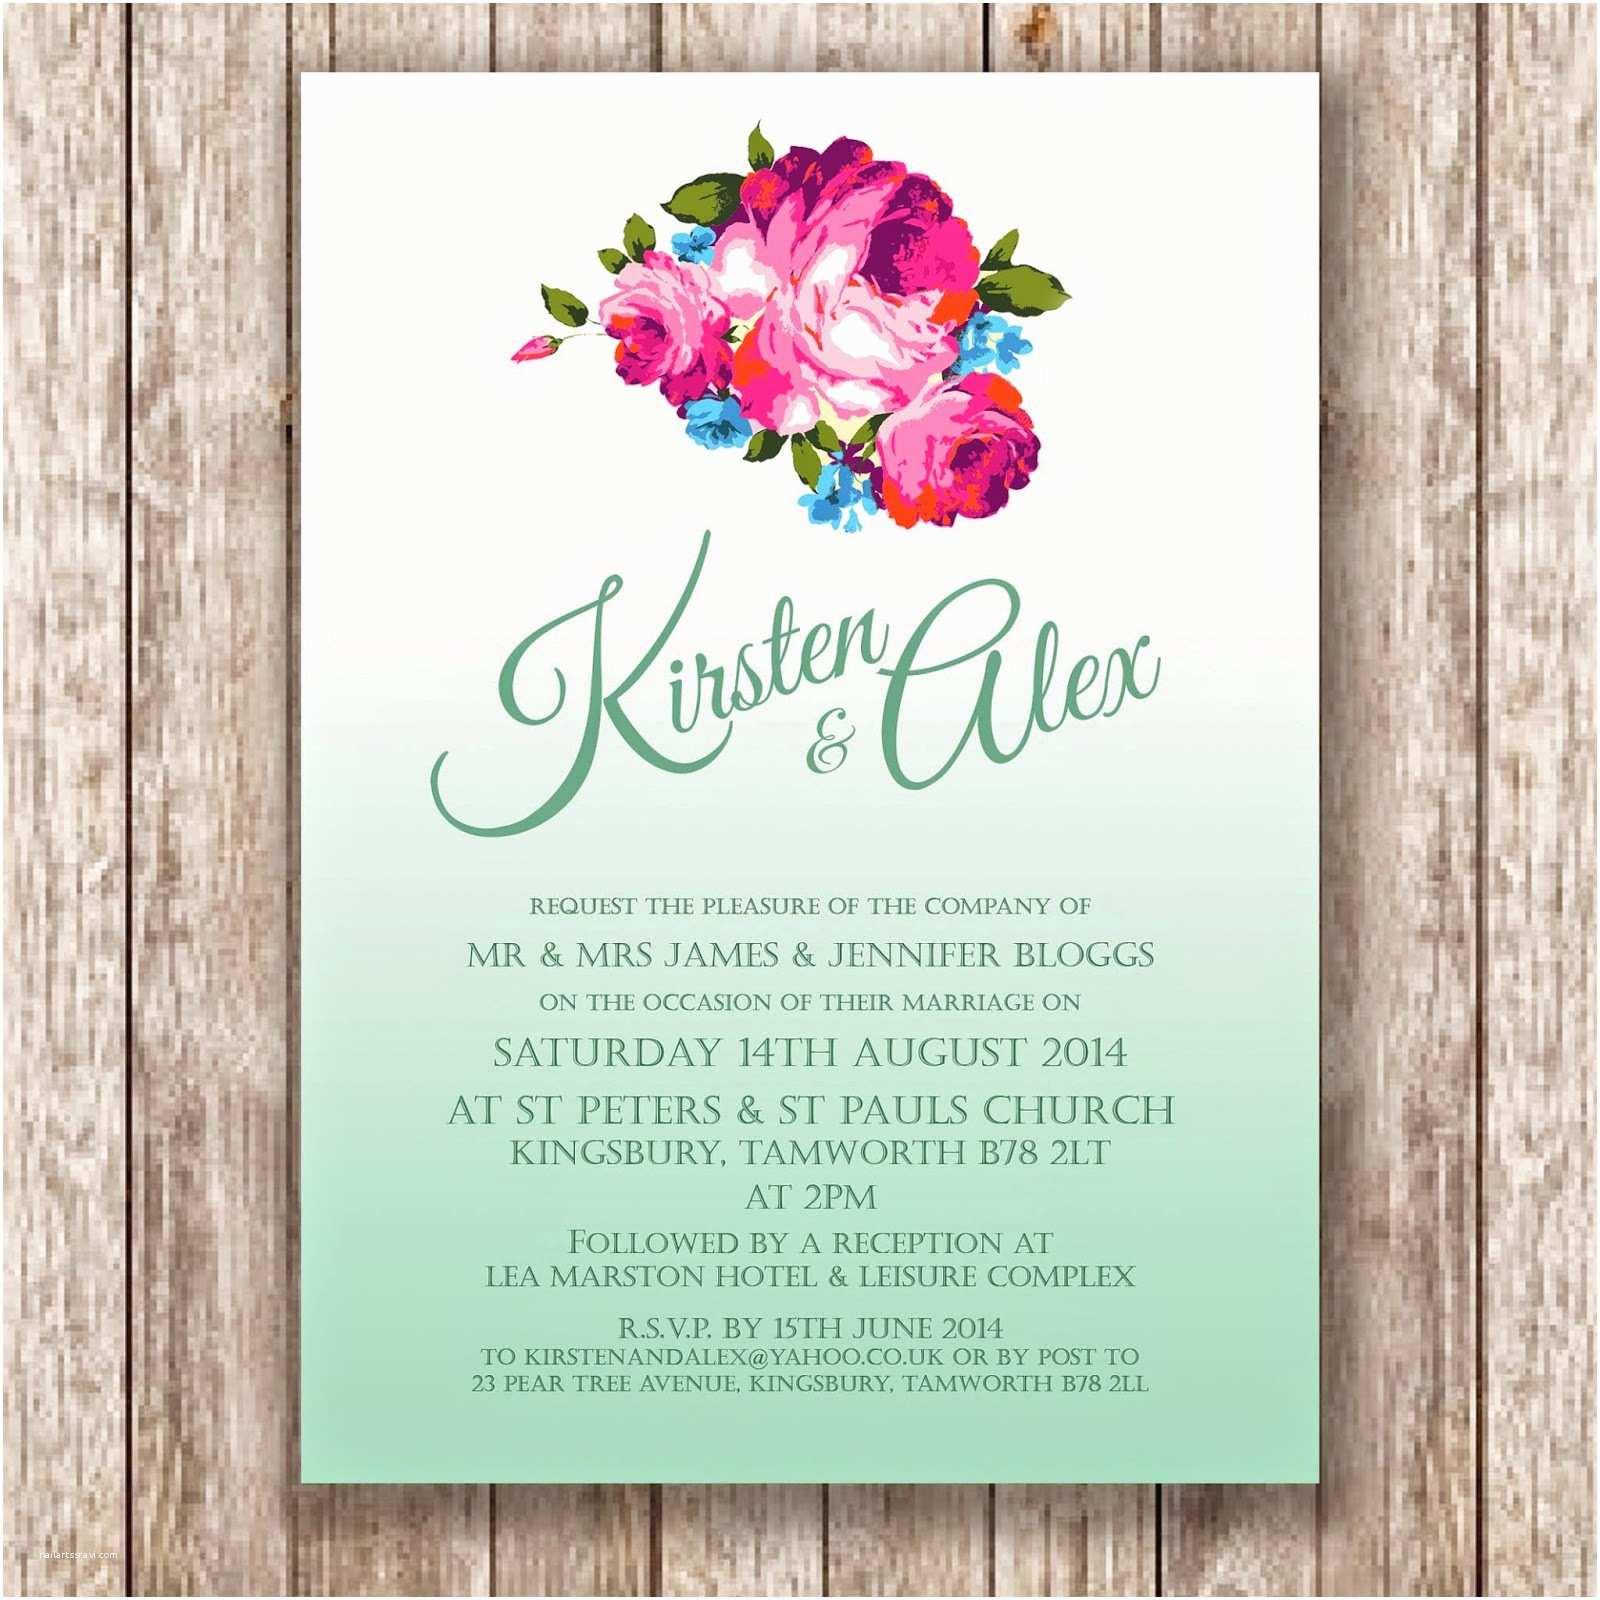 Wedding Invitation Design Images Create Own Digital Wedding Invitations Ideas